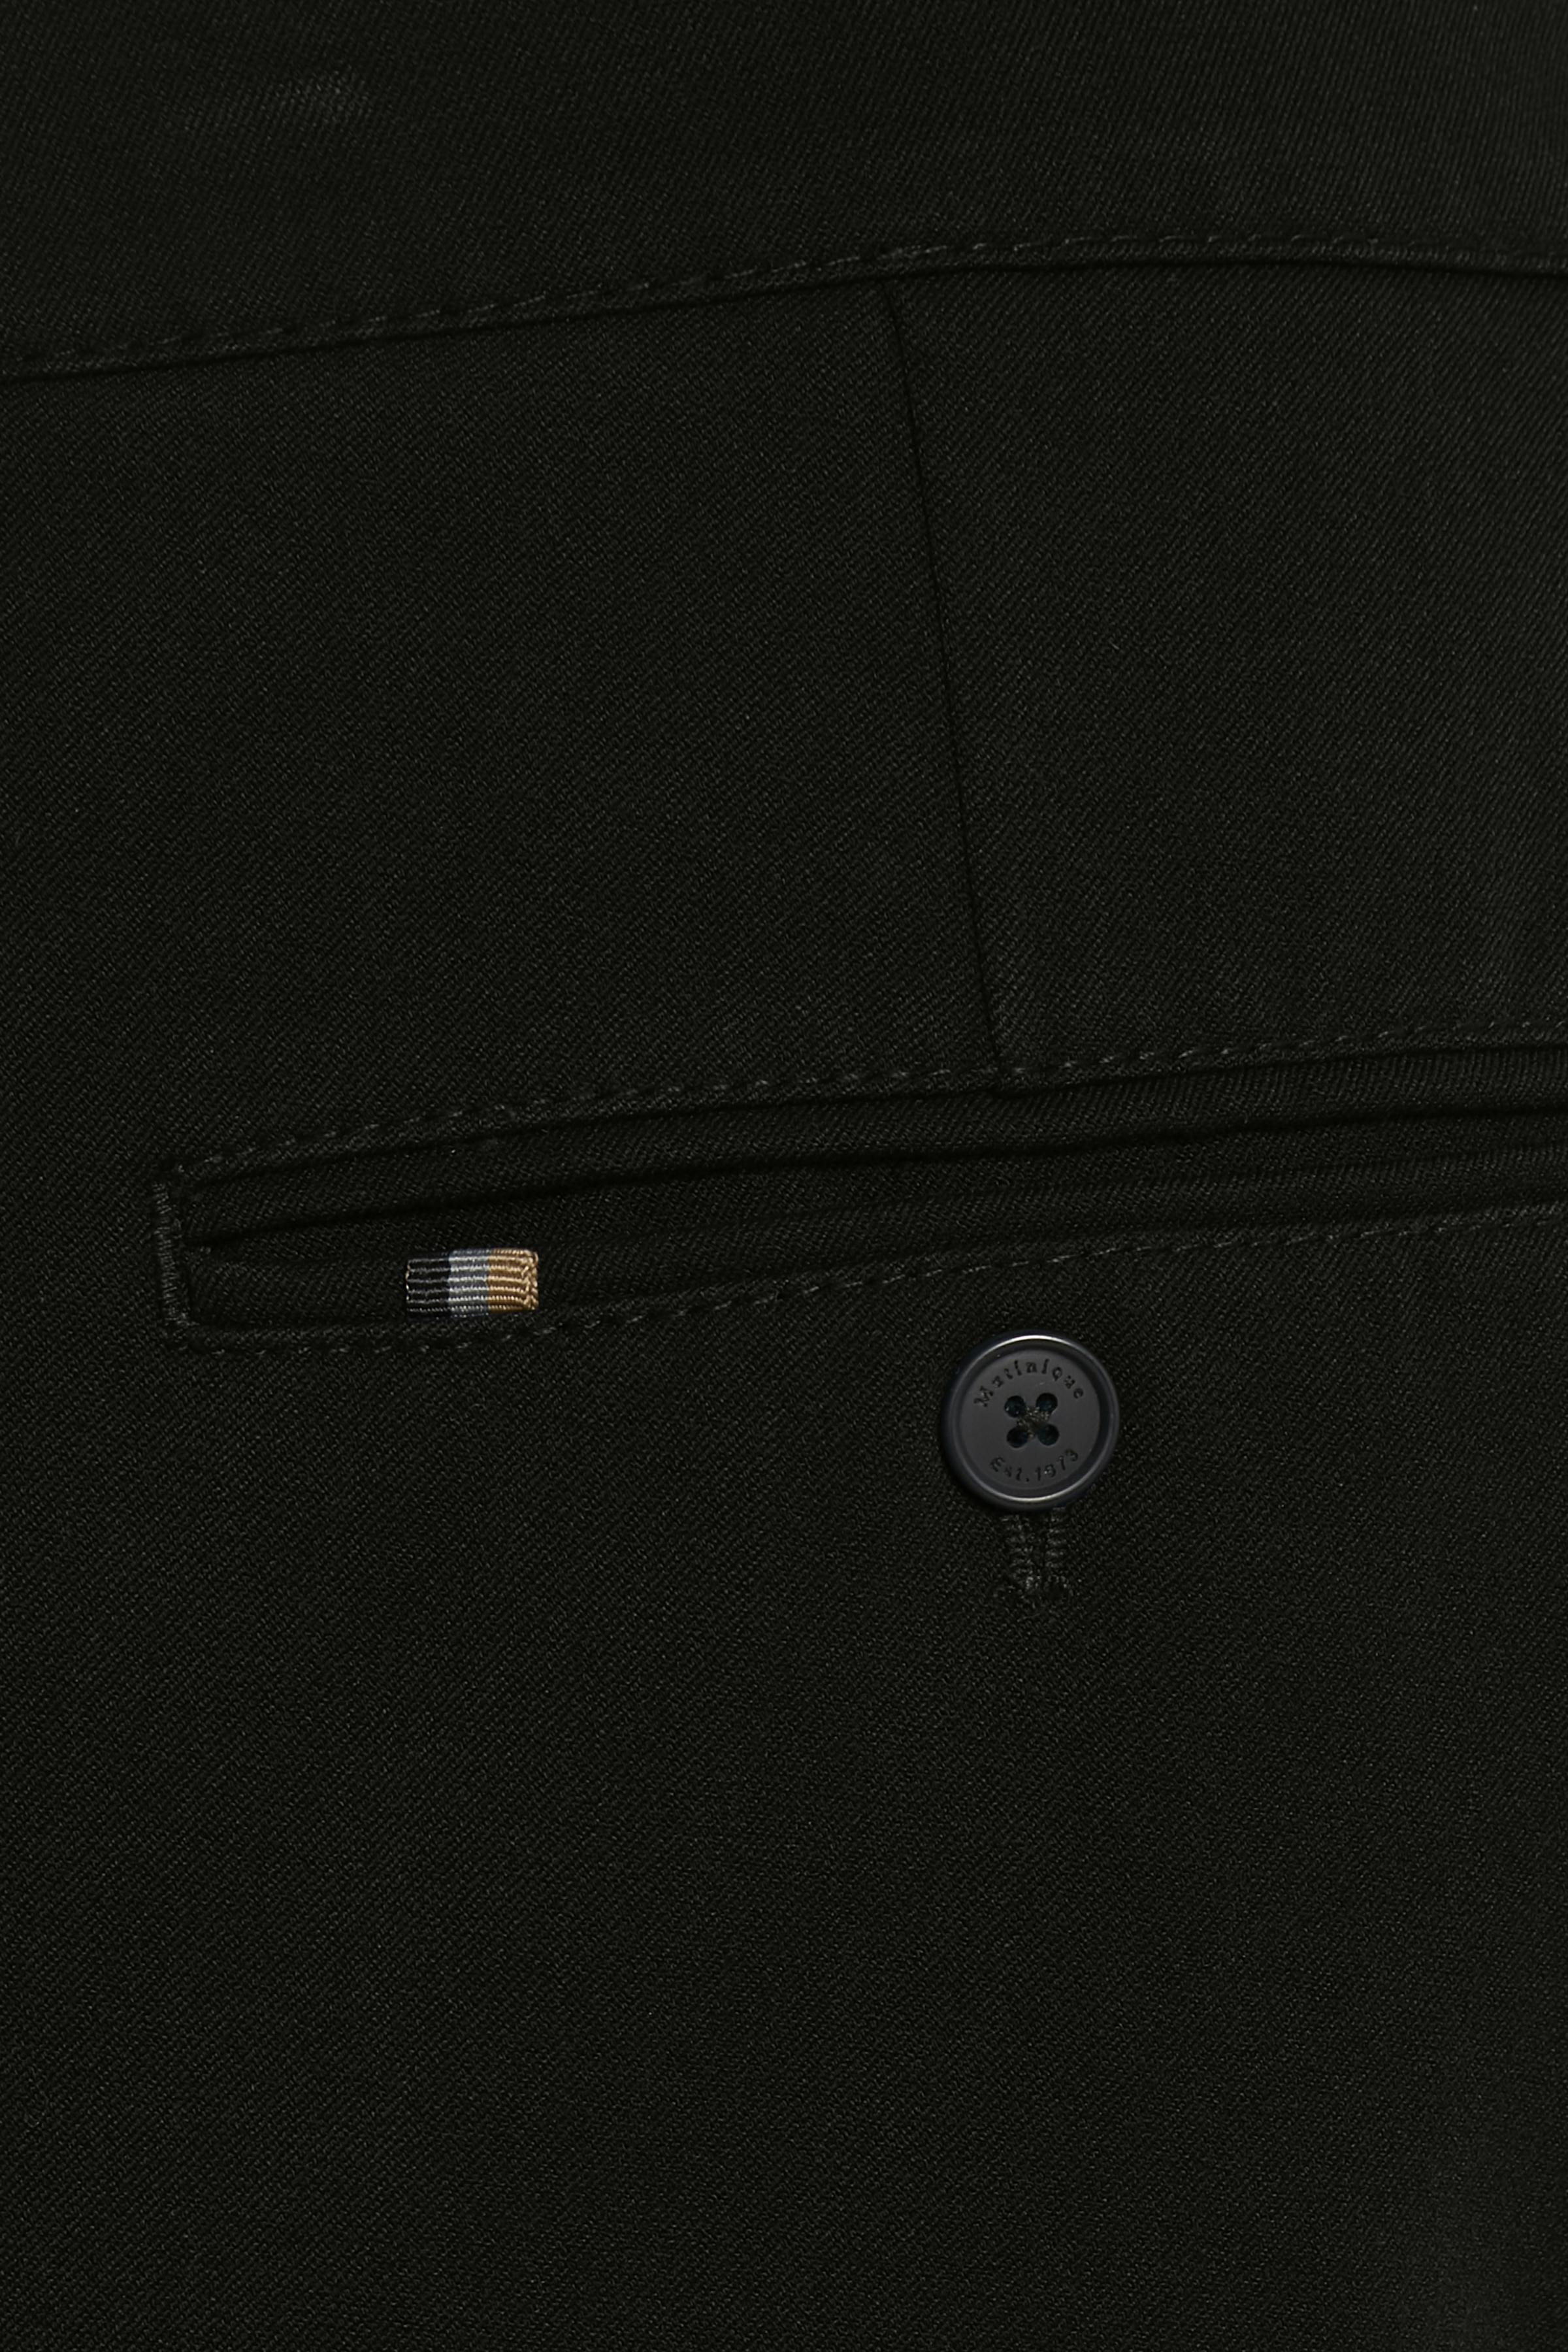 Black Paton Jersey Bukser – Køb Black Paton Jersey Bukser fra str. XL-XXL her